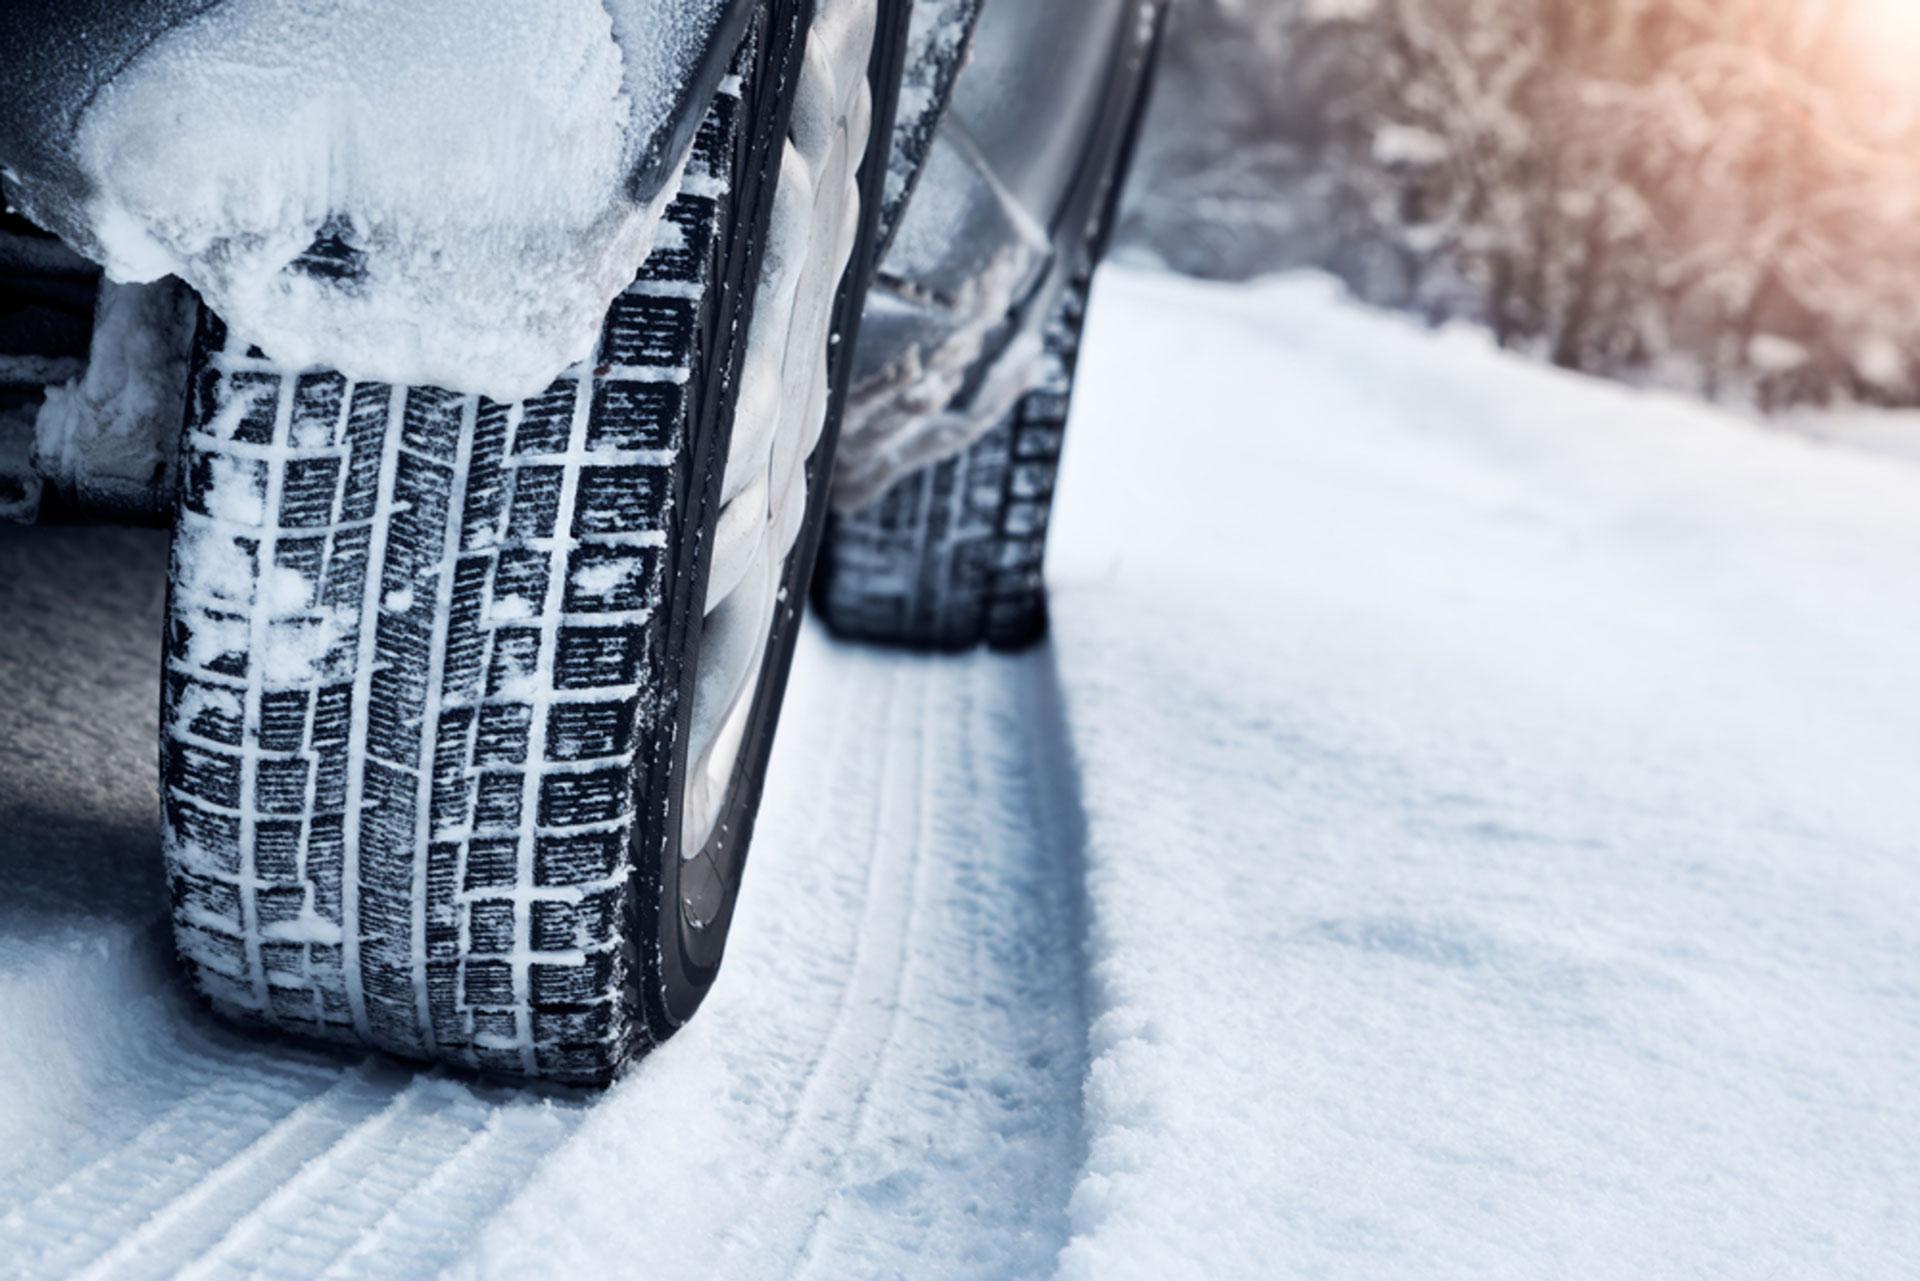 Kako pripremiti vozilo za zimski period